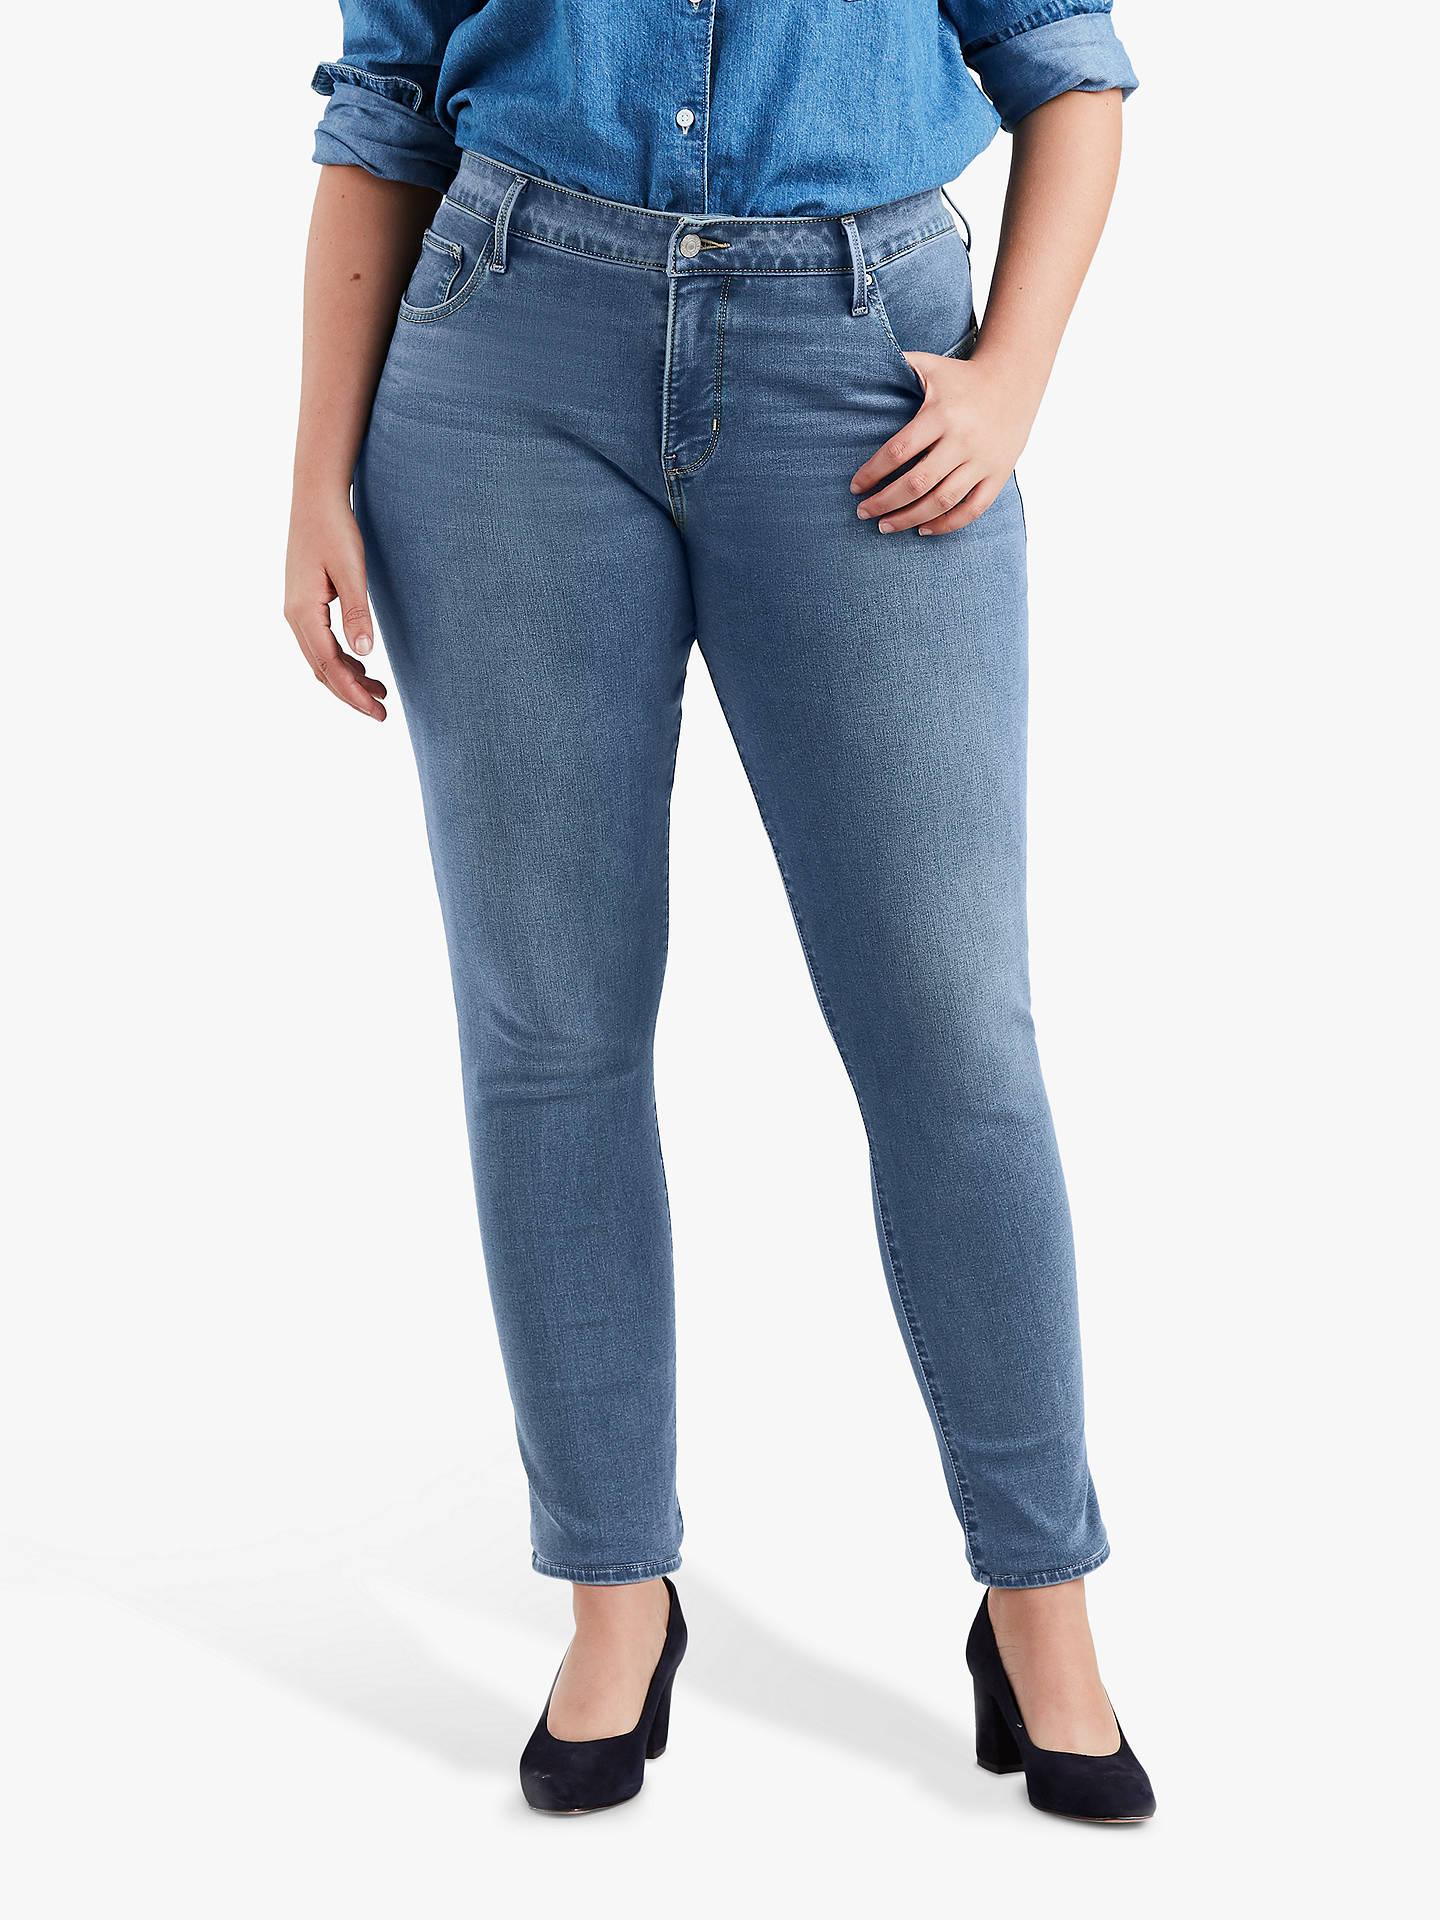 da9ea8785f9 BuyLevi s Plus 311 Shaping Skinny Jeans